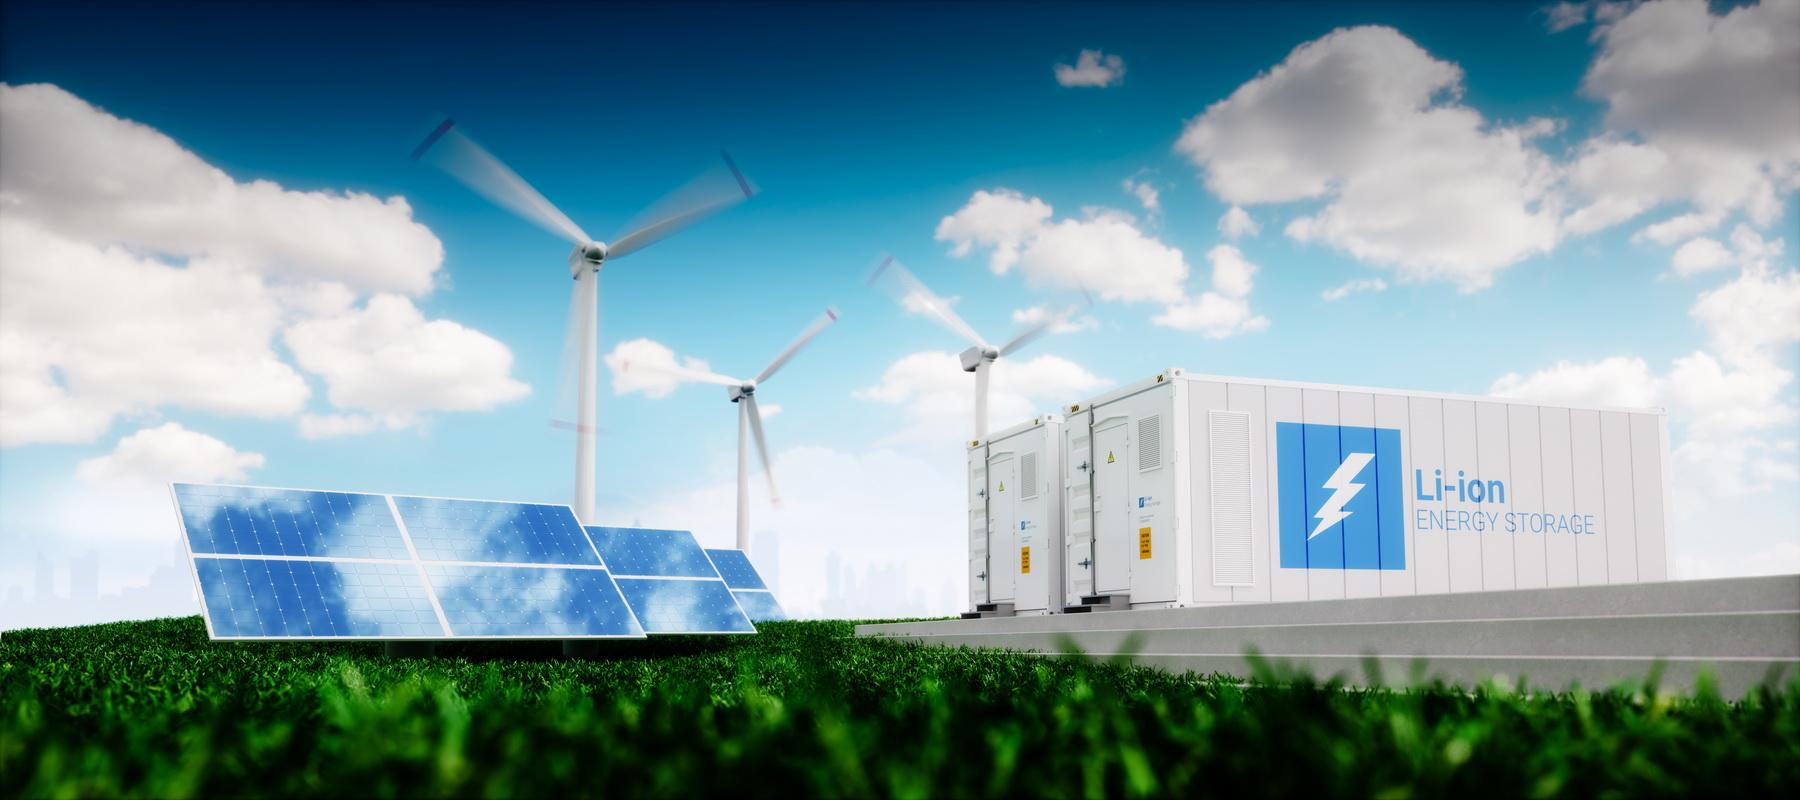 21st Century Clean Energy